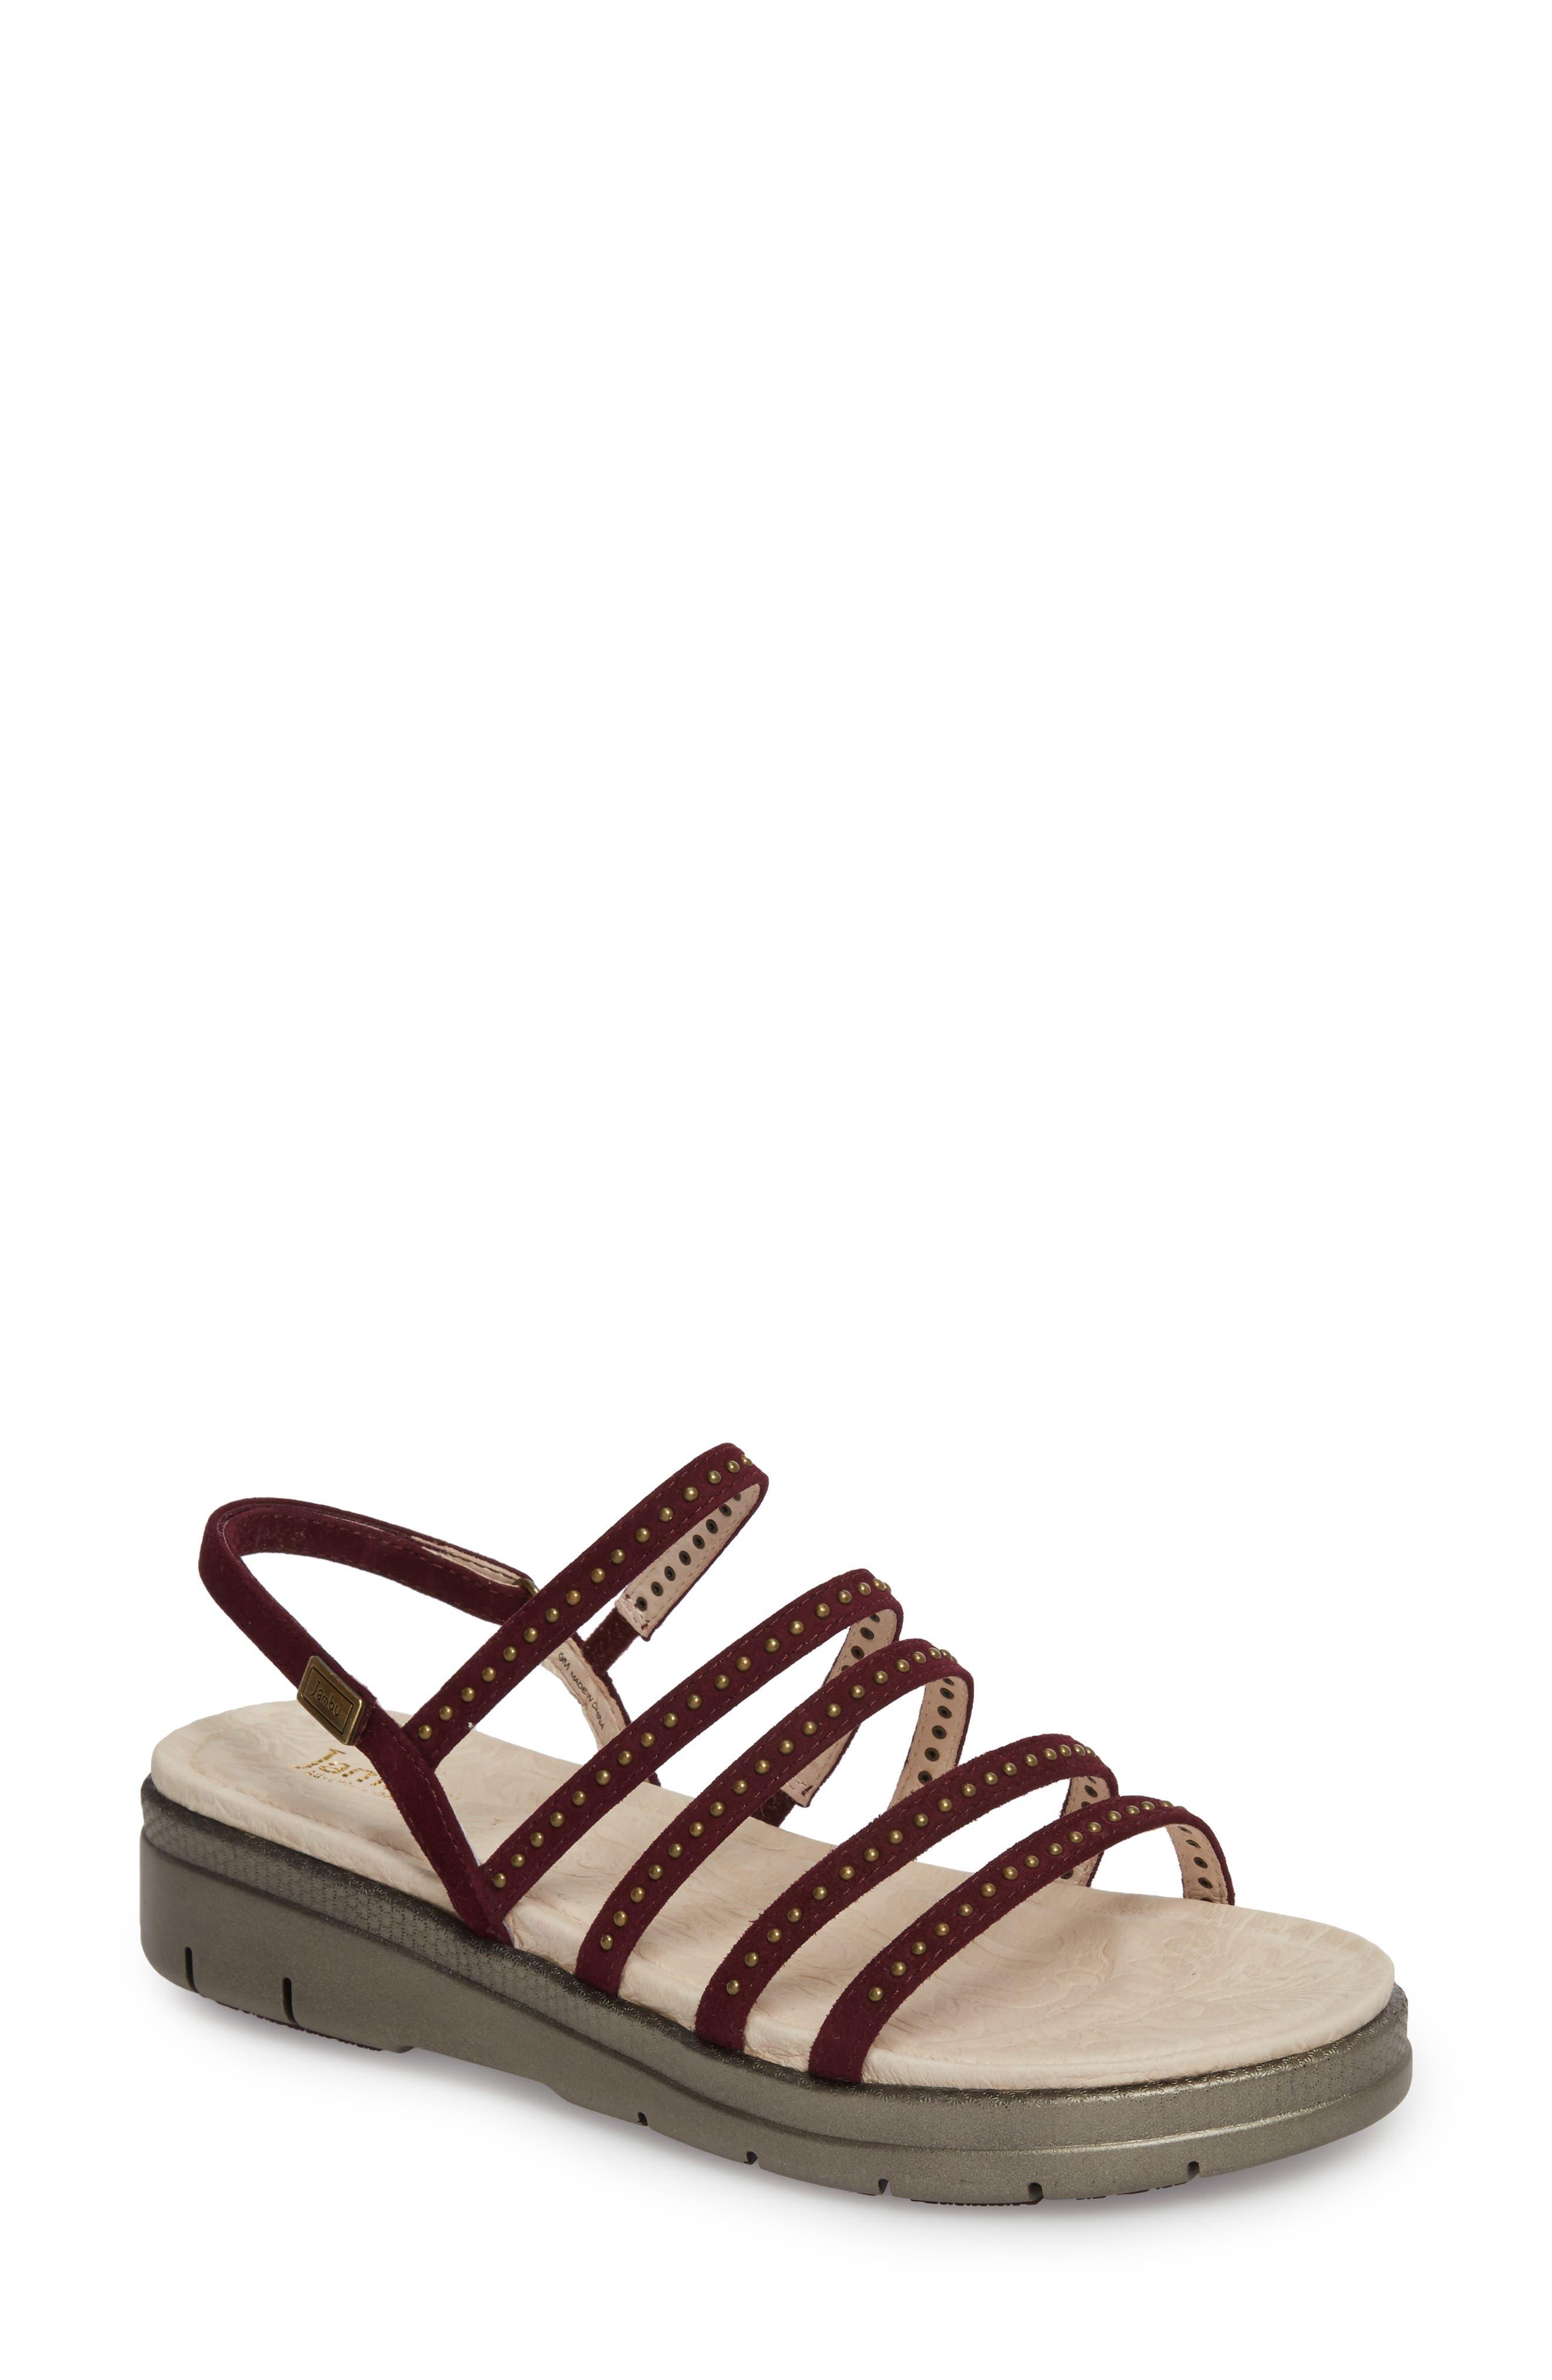 Elegance Studded Strappy Sandal,                         Main,                         color, WINE SUEDE